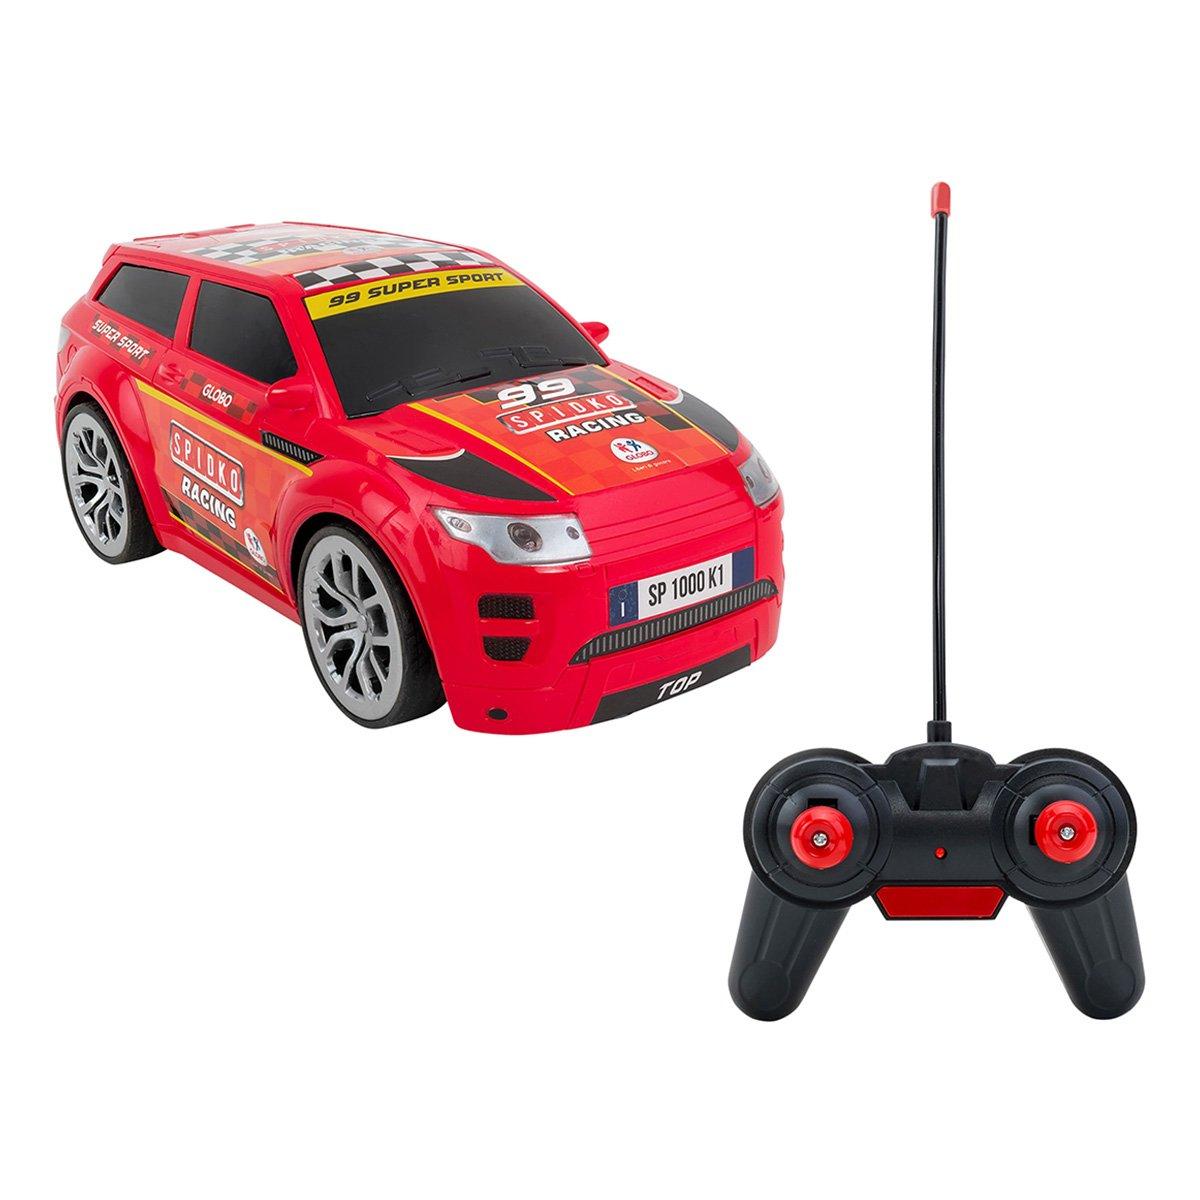 Masinuta cu telecomanda Globo Suv WRC, Rosu 99